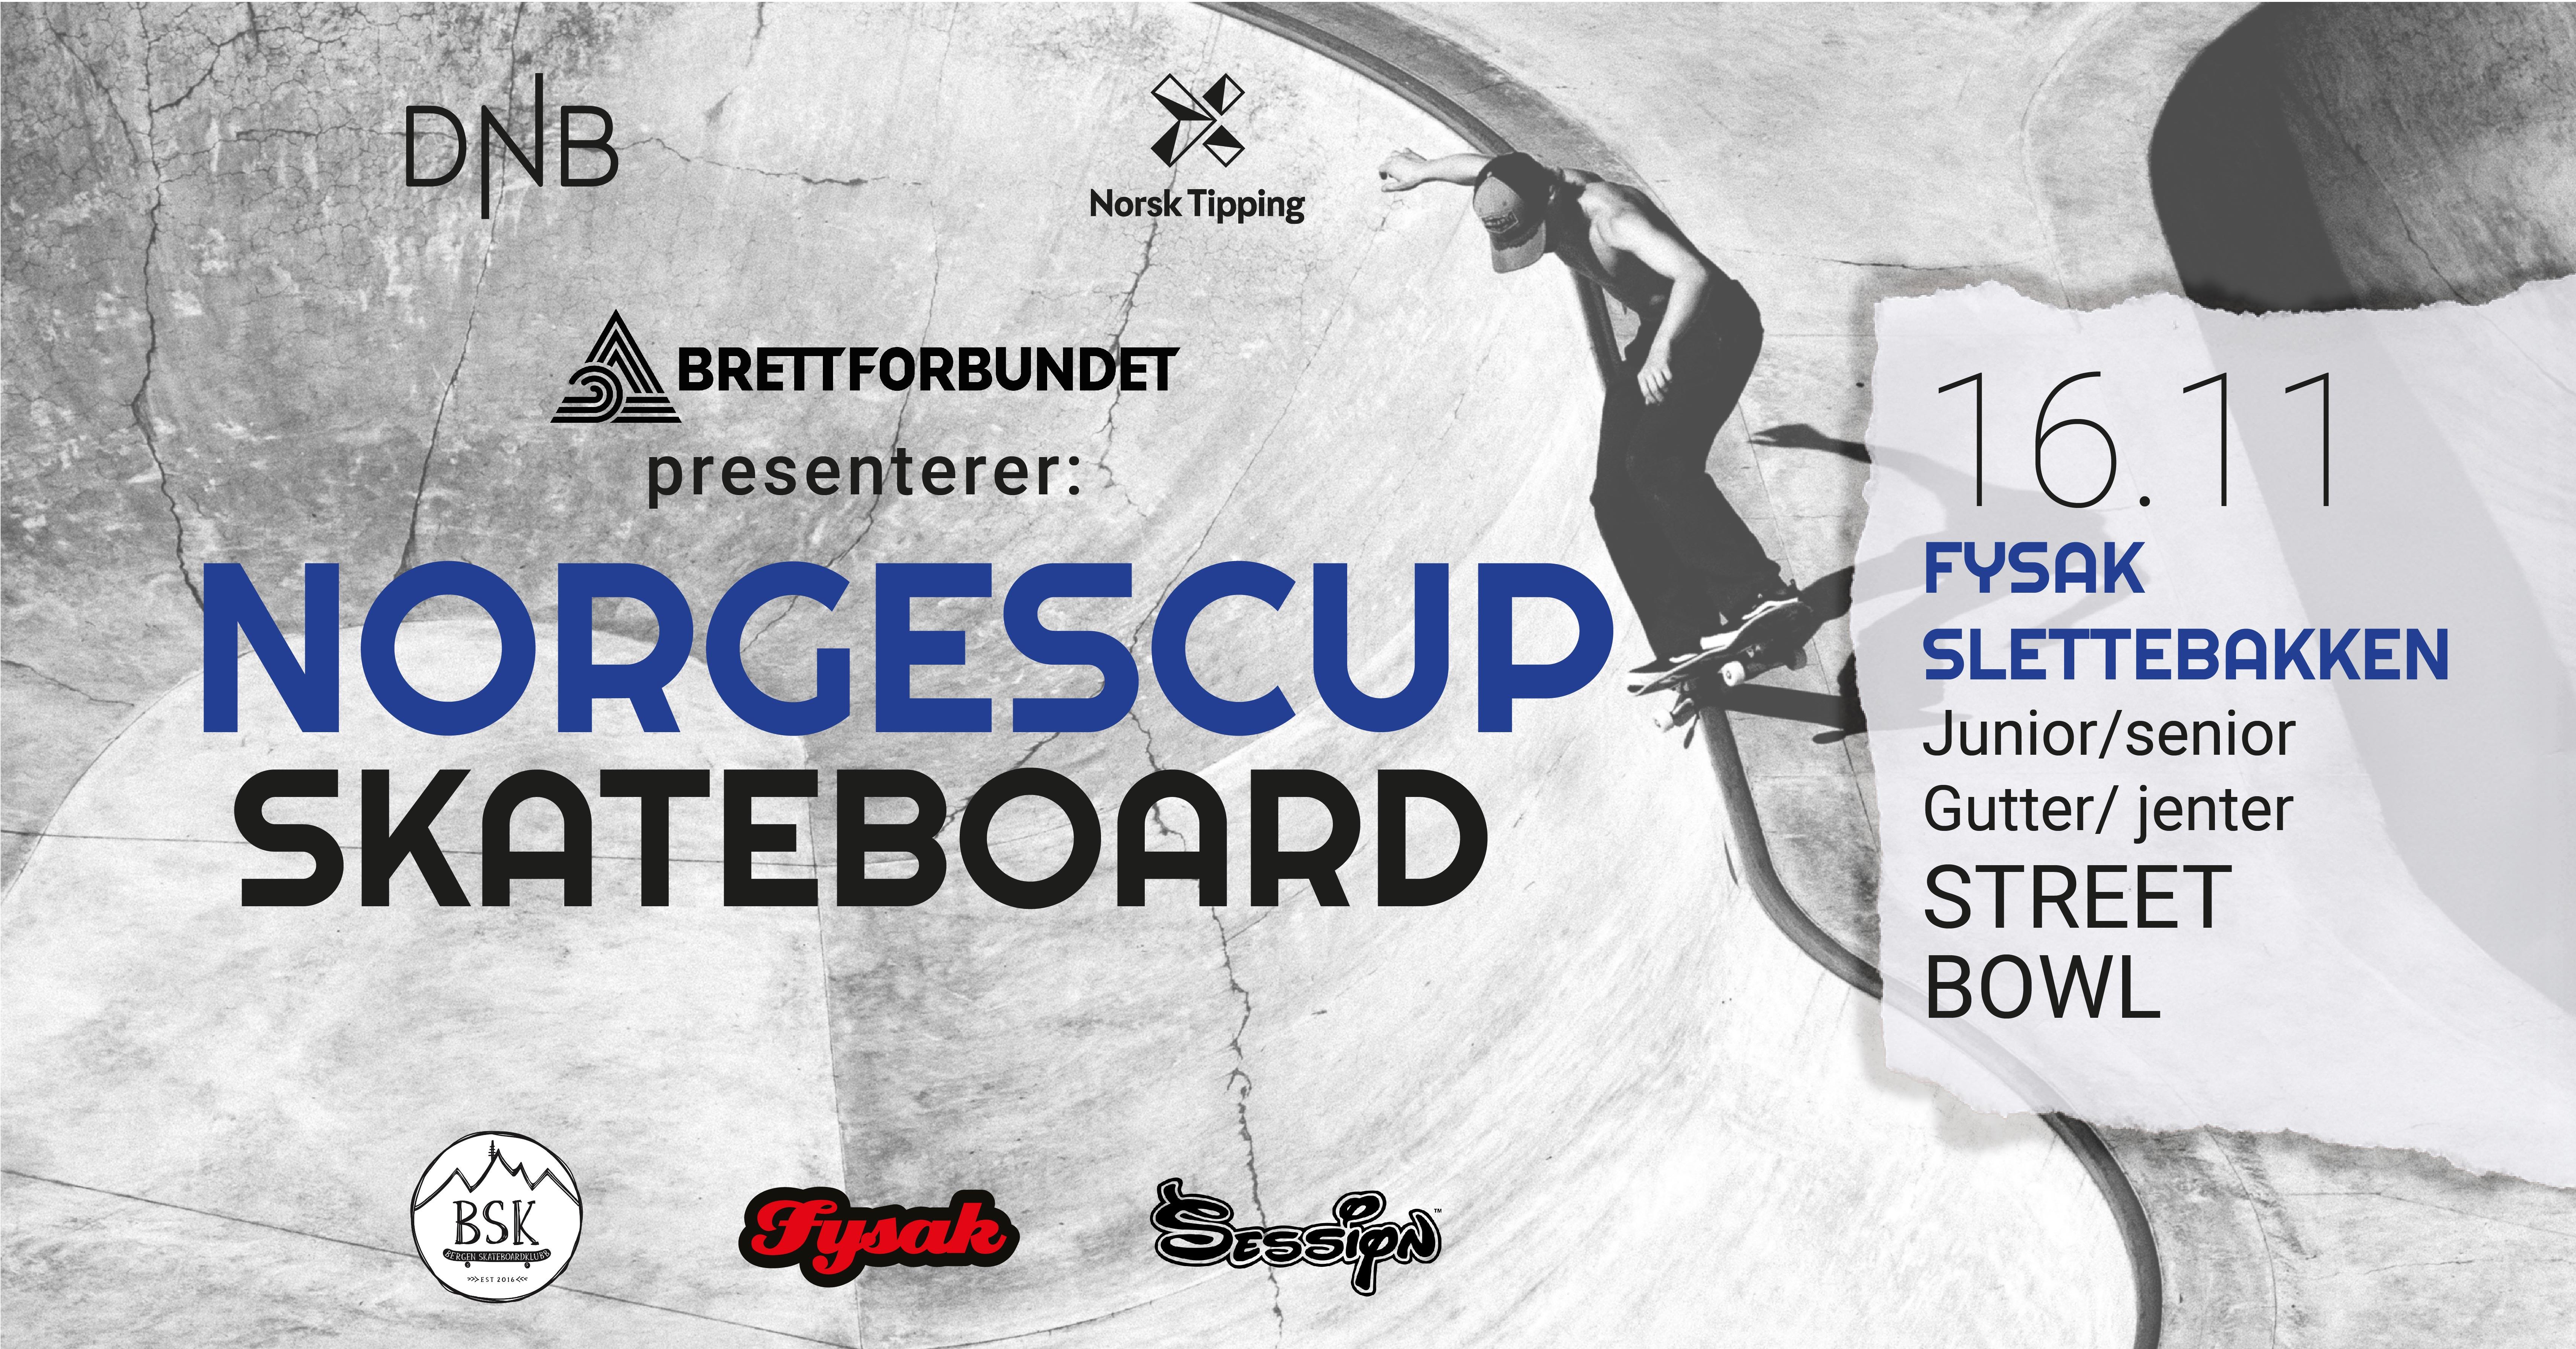 Norgescup - Bergen | Skateboard